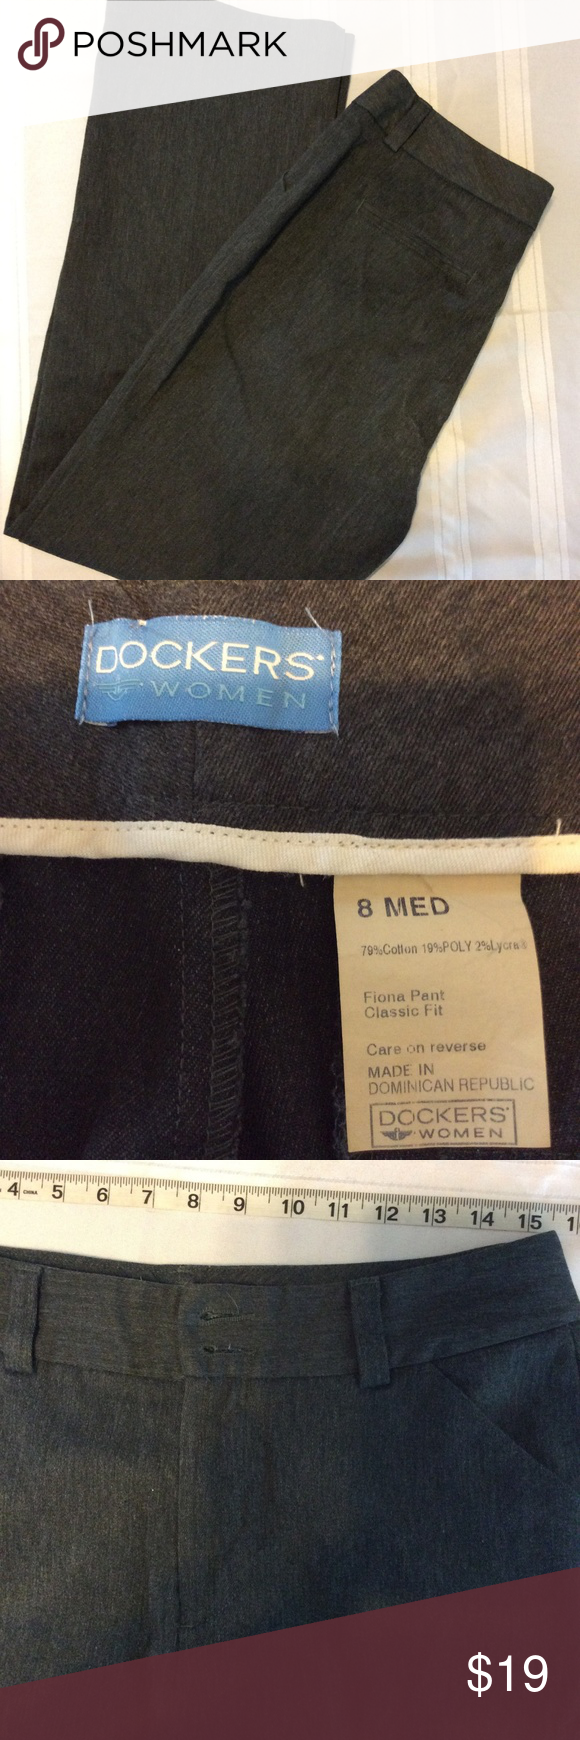 Dockers Womens Classic Pant Med Gray Dress Slacks 100